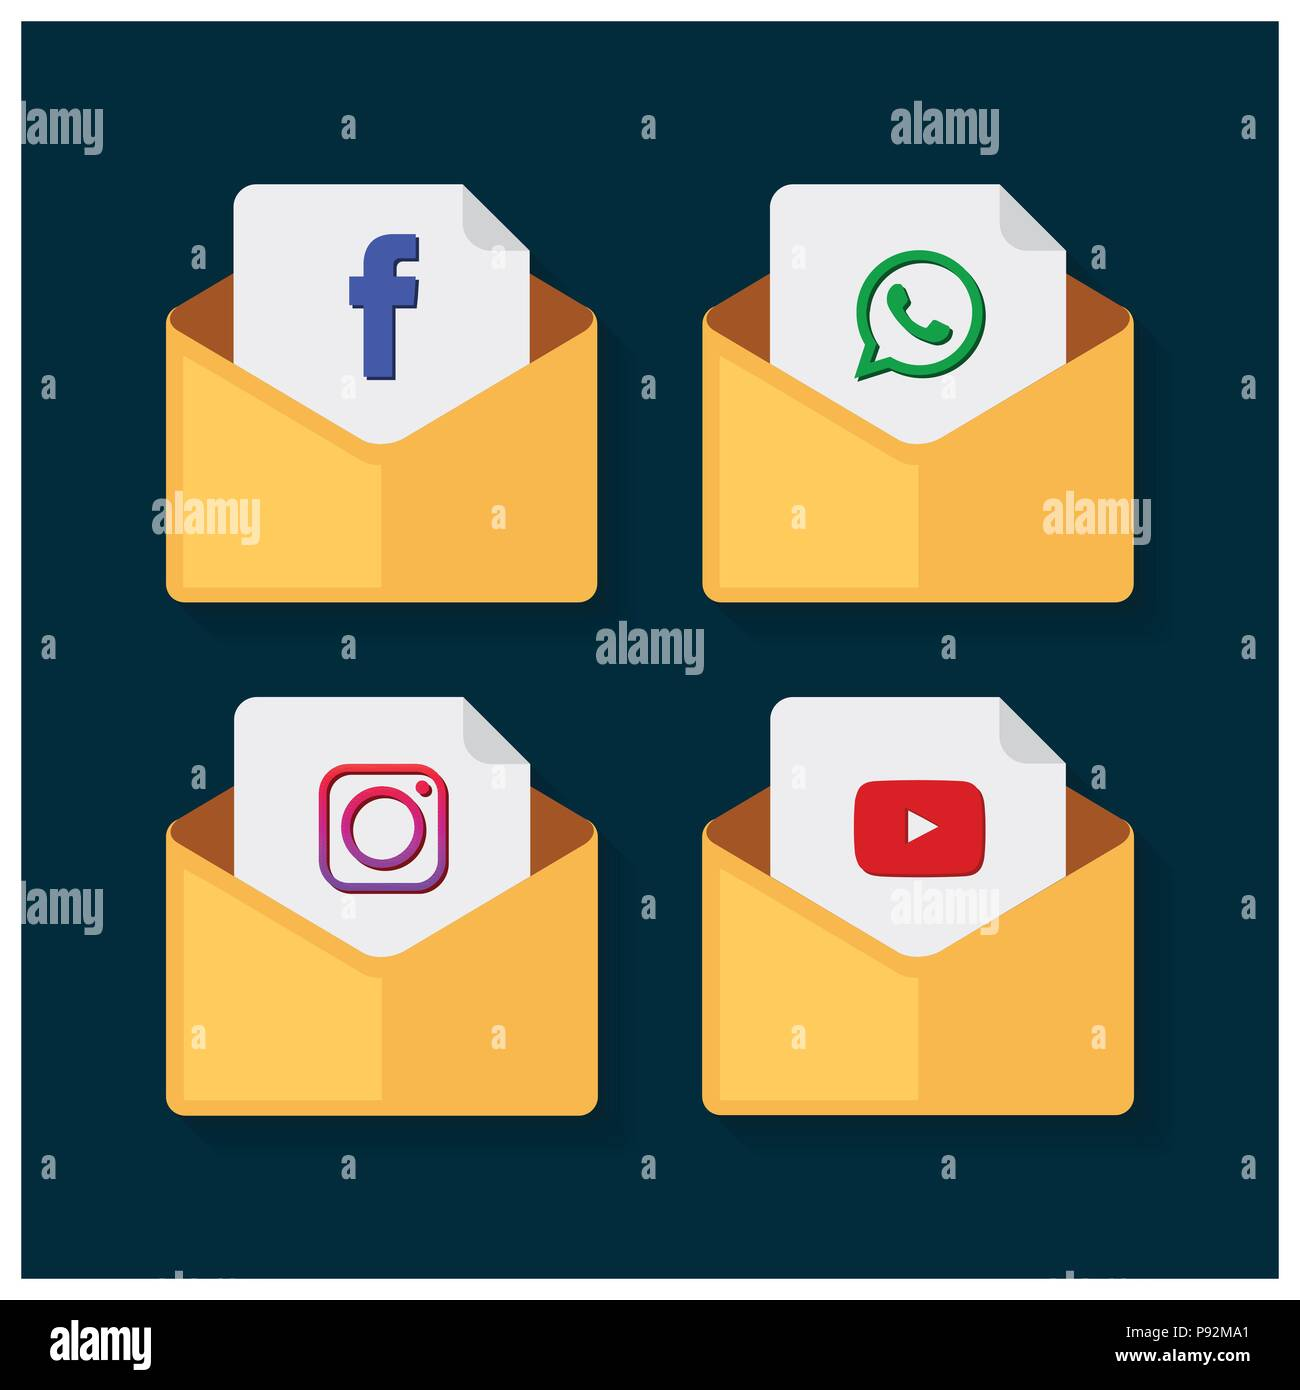 Set Of Flat Design Sale Stickers Vector Illustrations Of Facebook